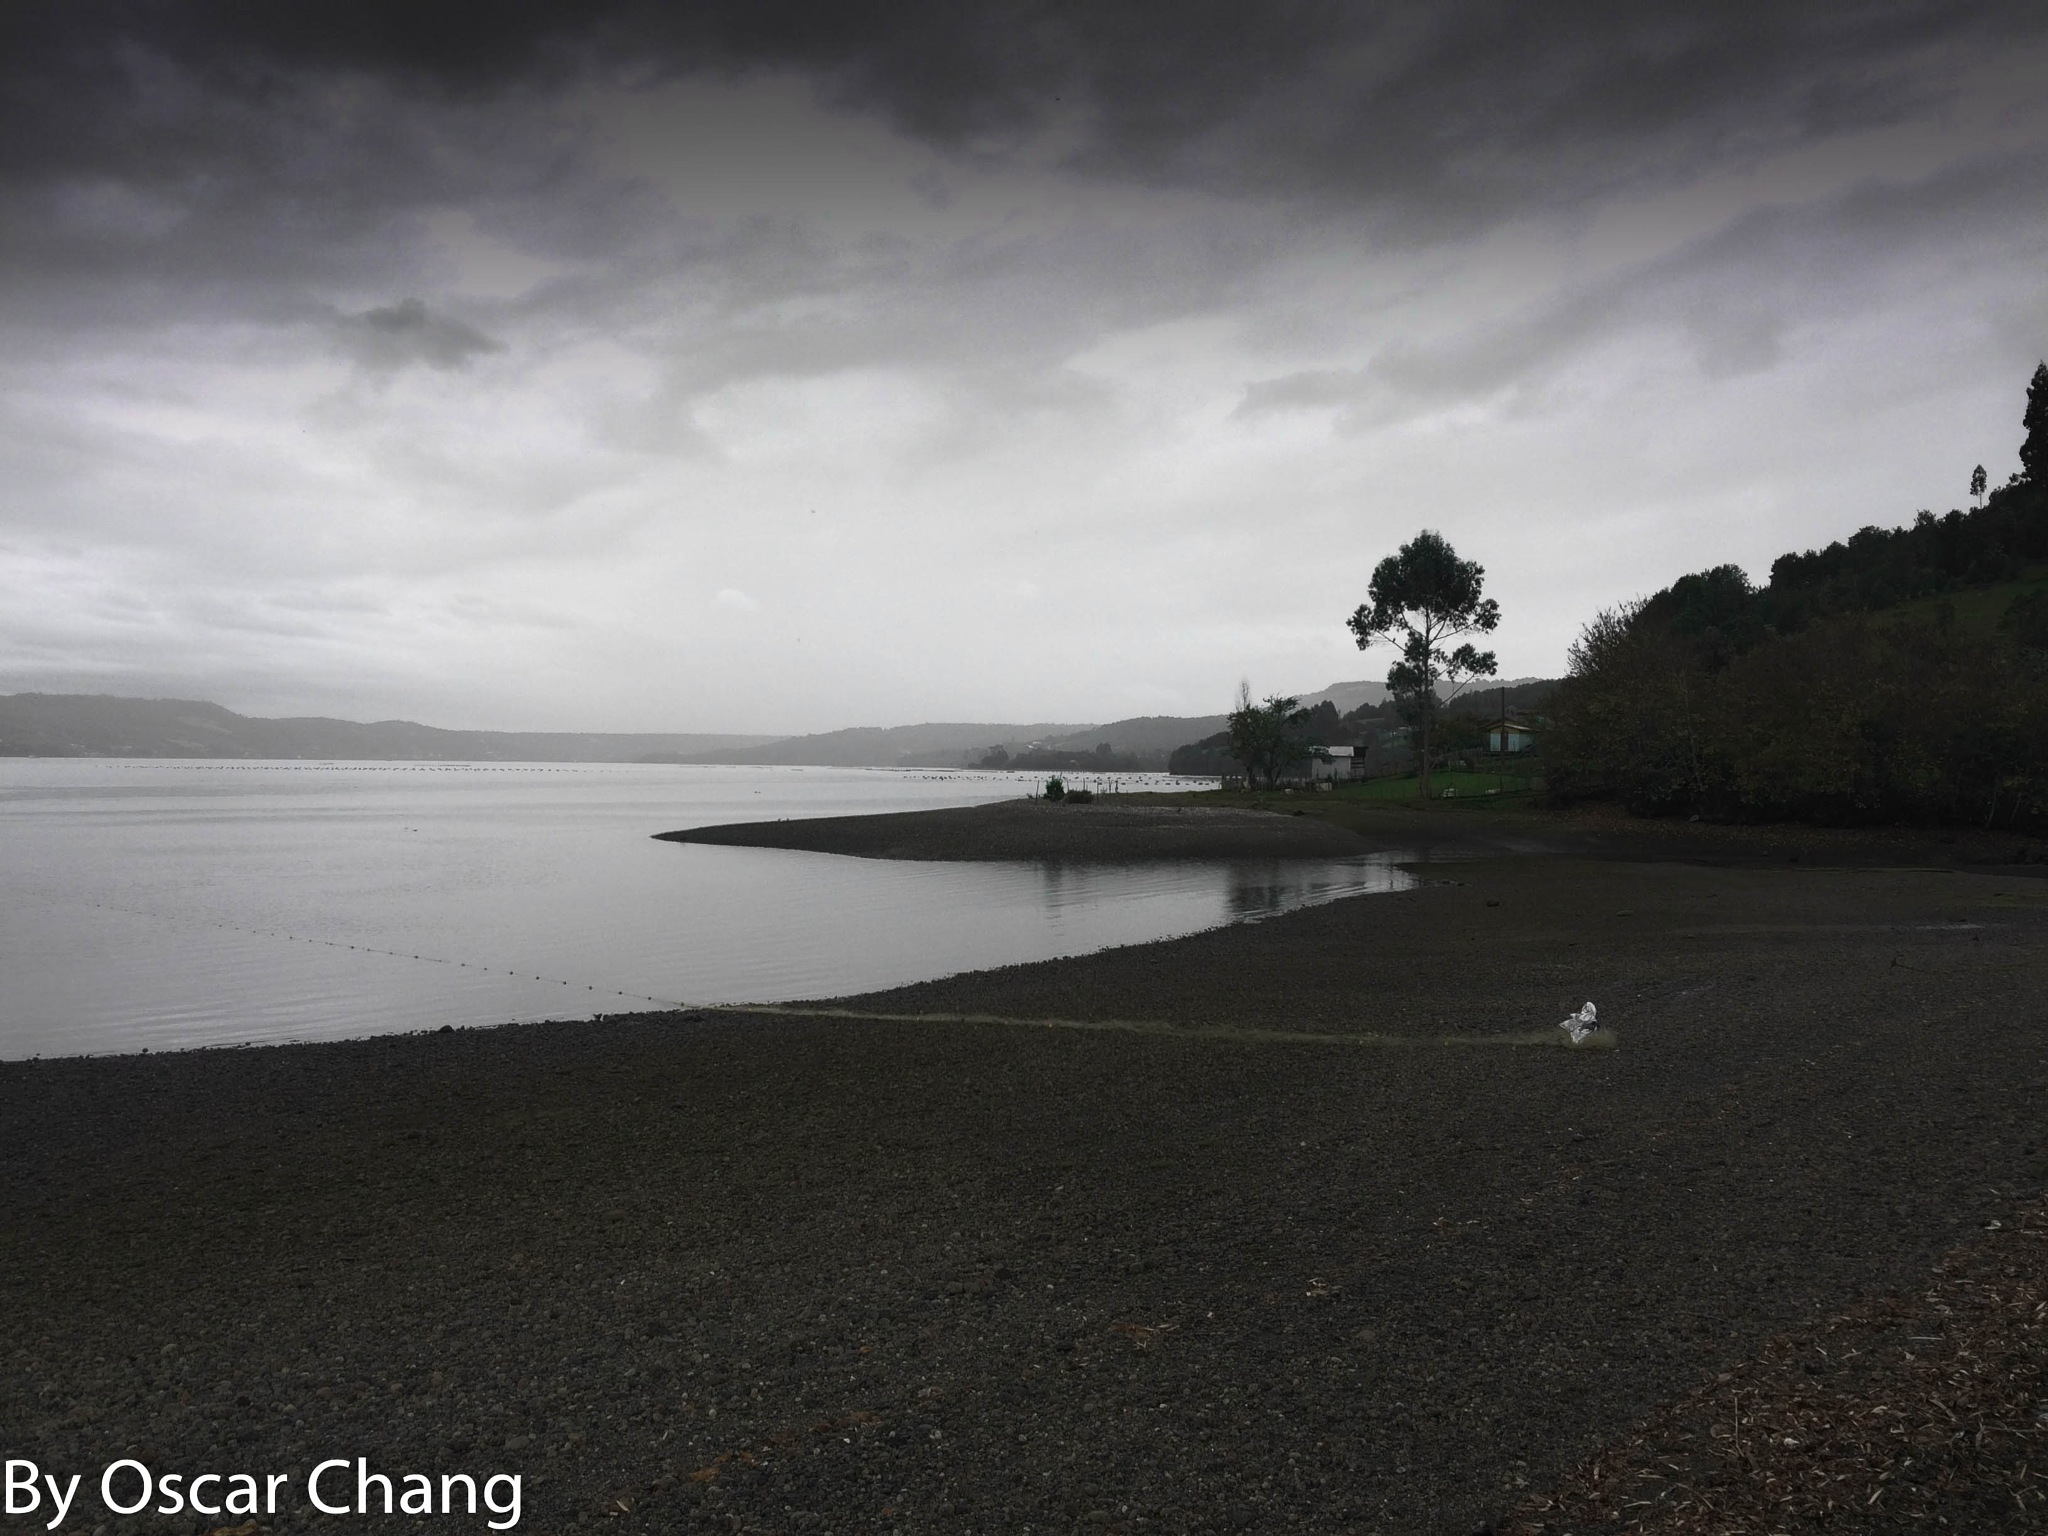 Aulen by Oscar Chang